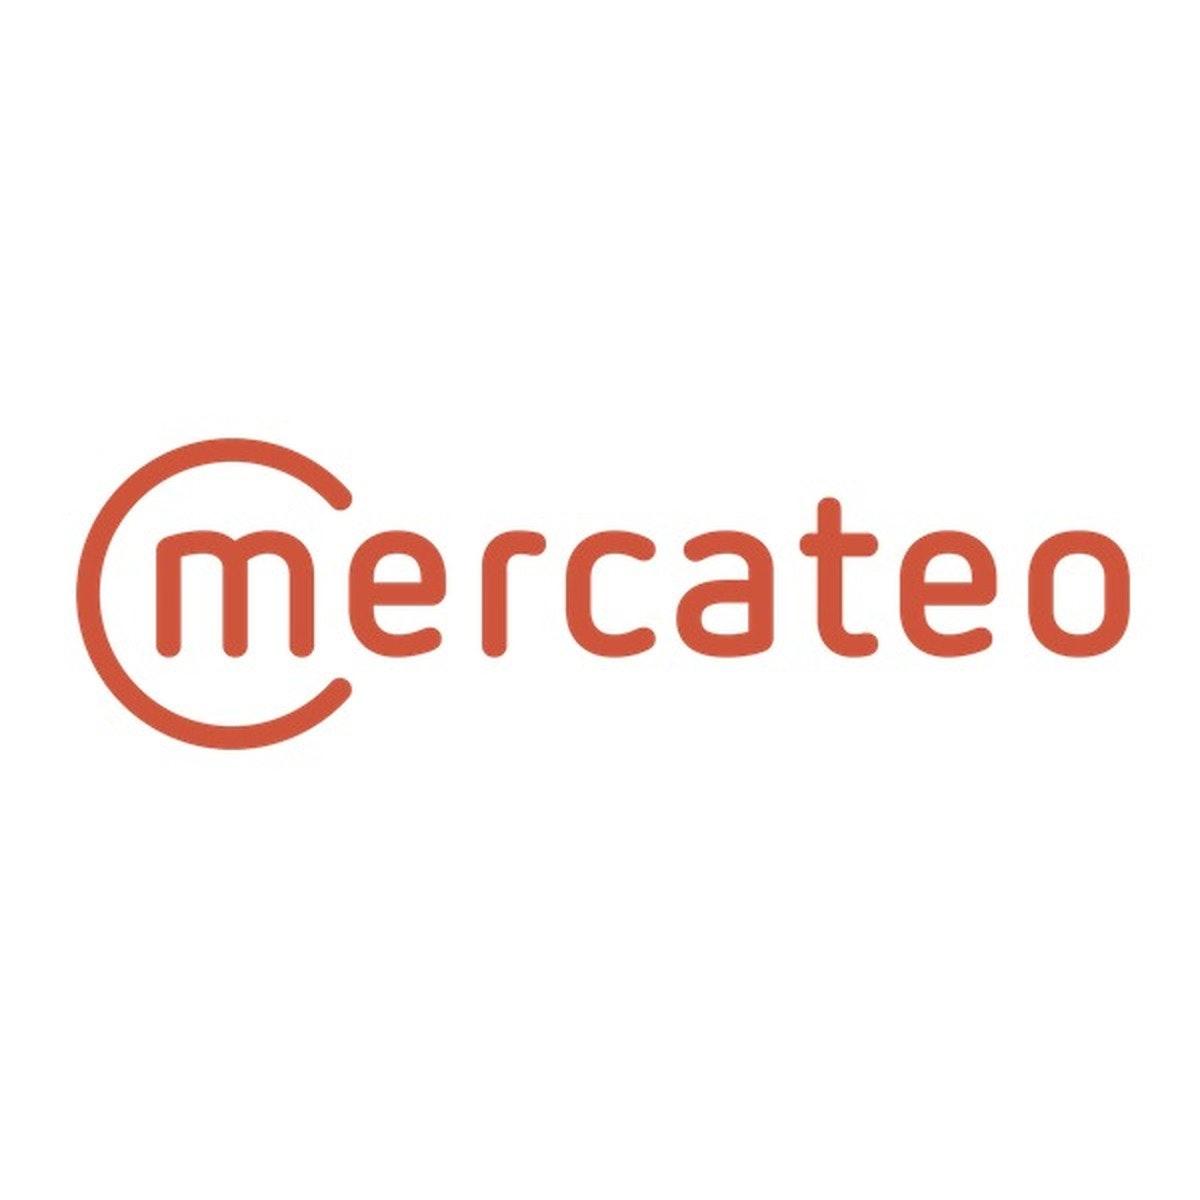 Mercateo Services GmbH & Co. KG